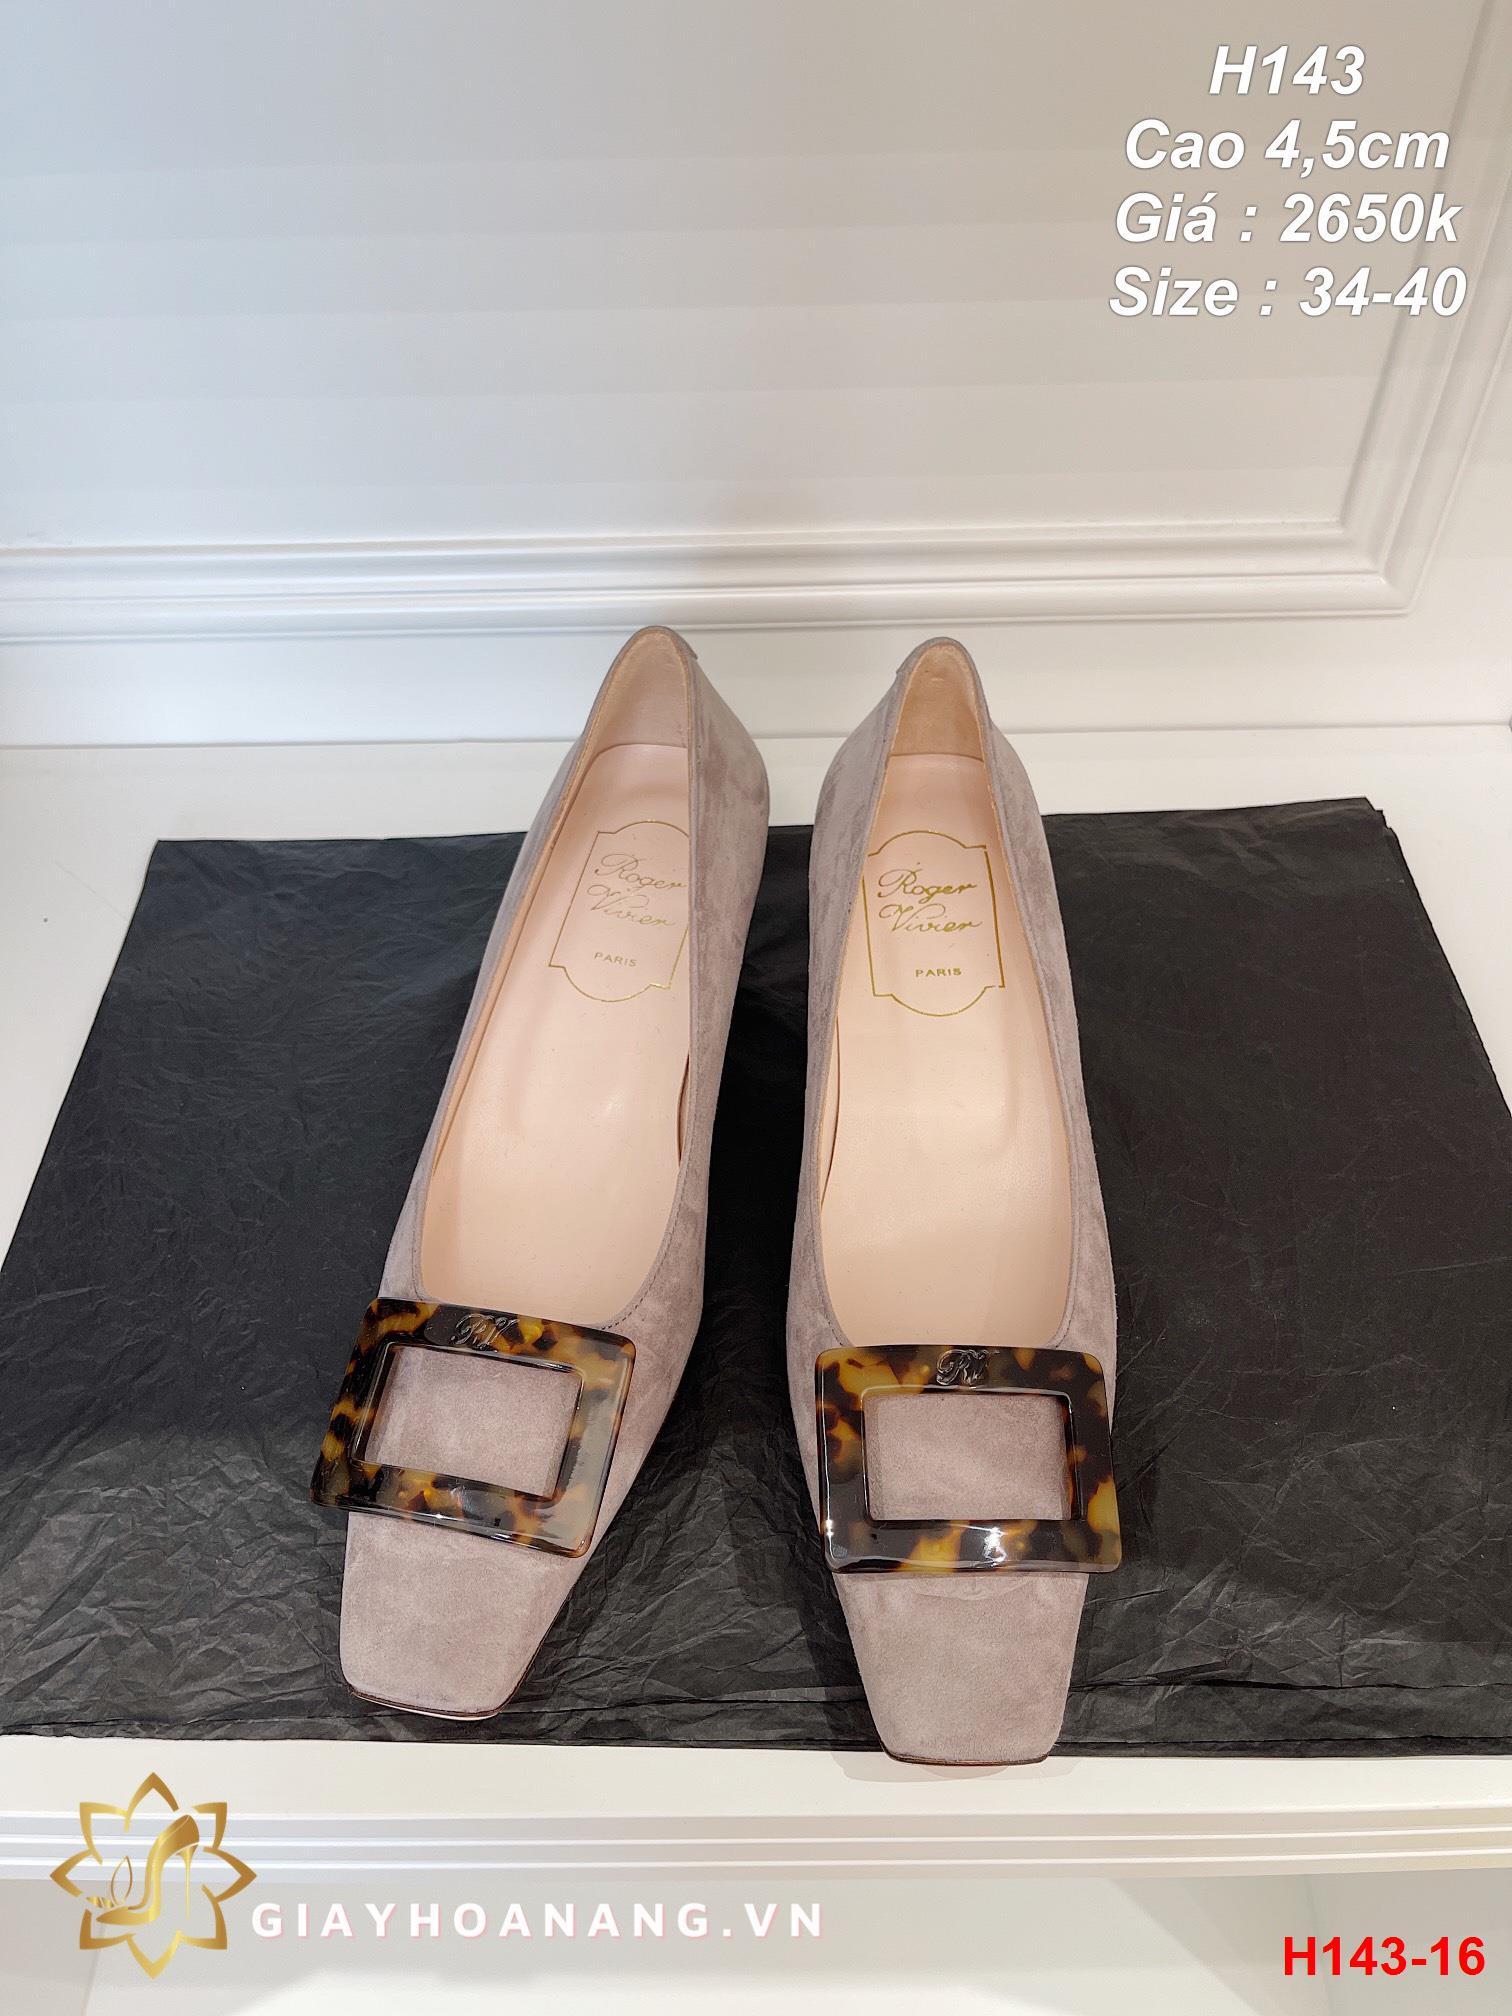 H143-16 Roger Vivier giày cao 4,5cm siêu cấp